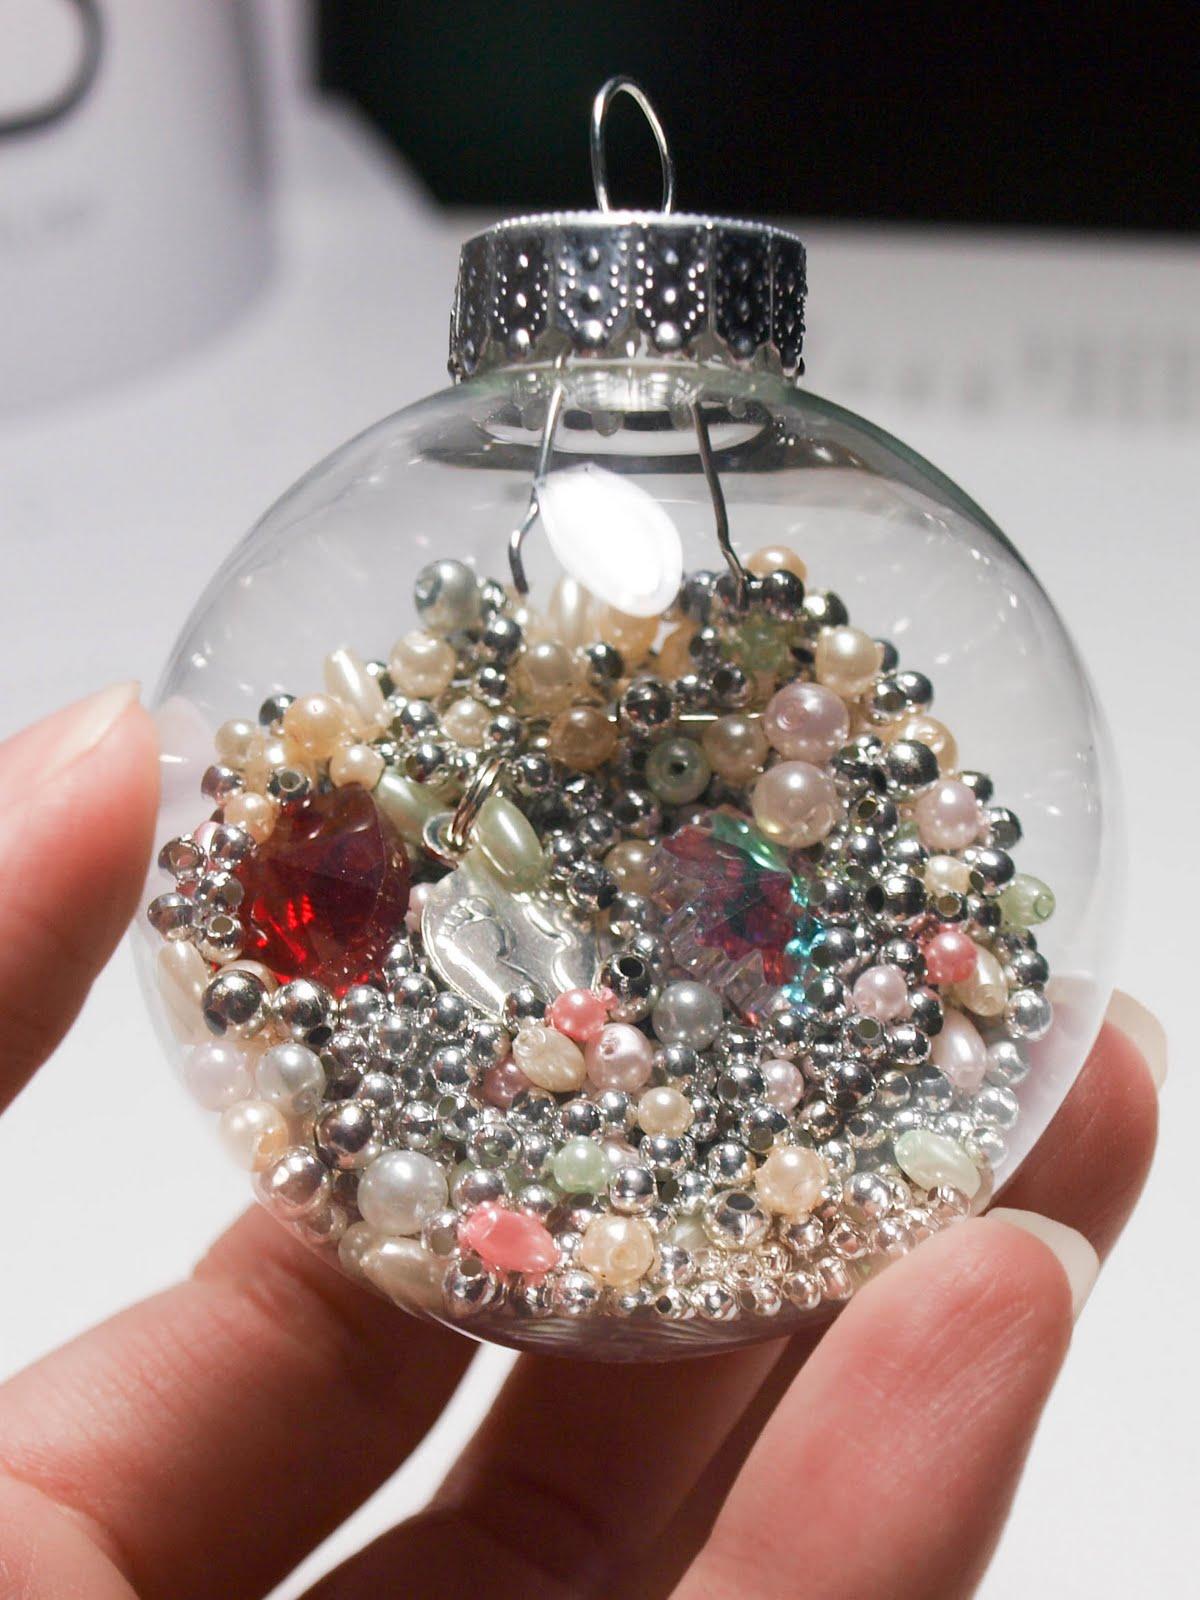 Cook~Love~Craft: DIY I-Spy Ornament for Kids